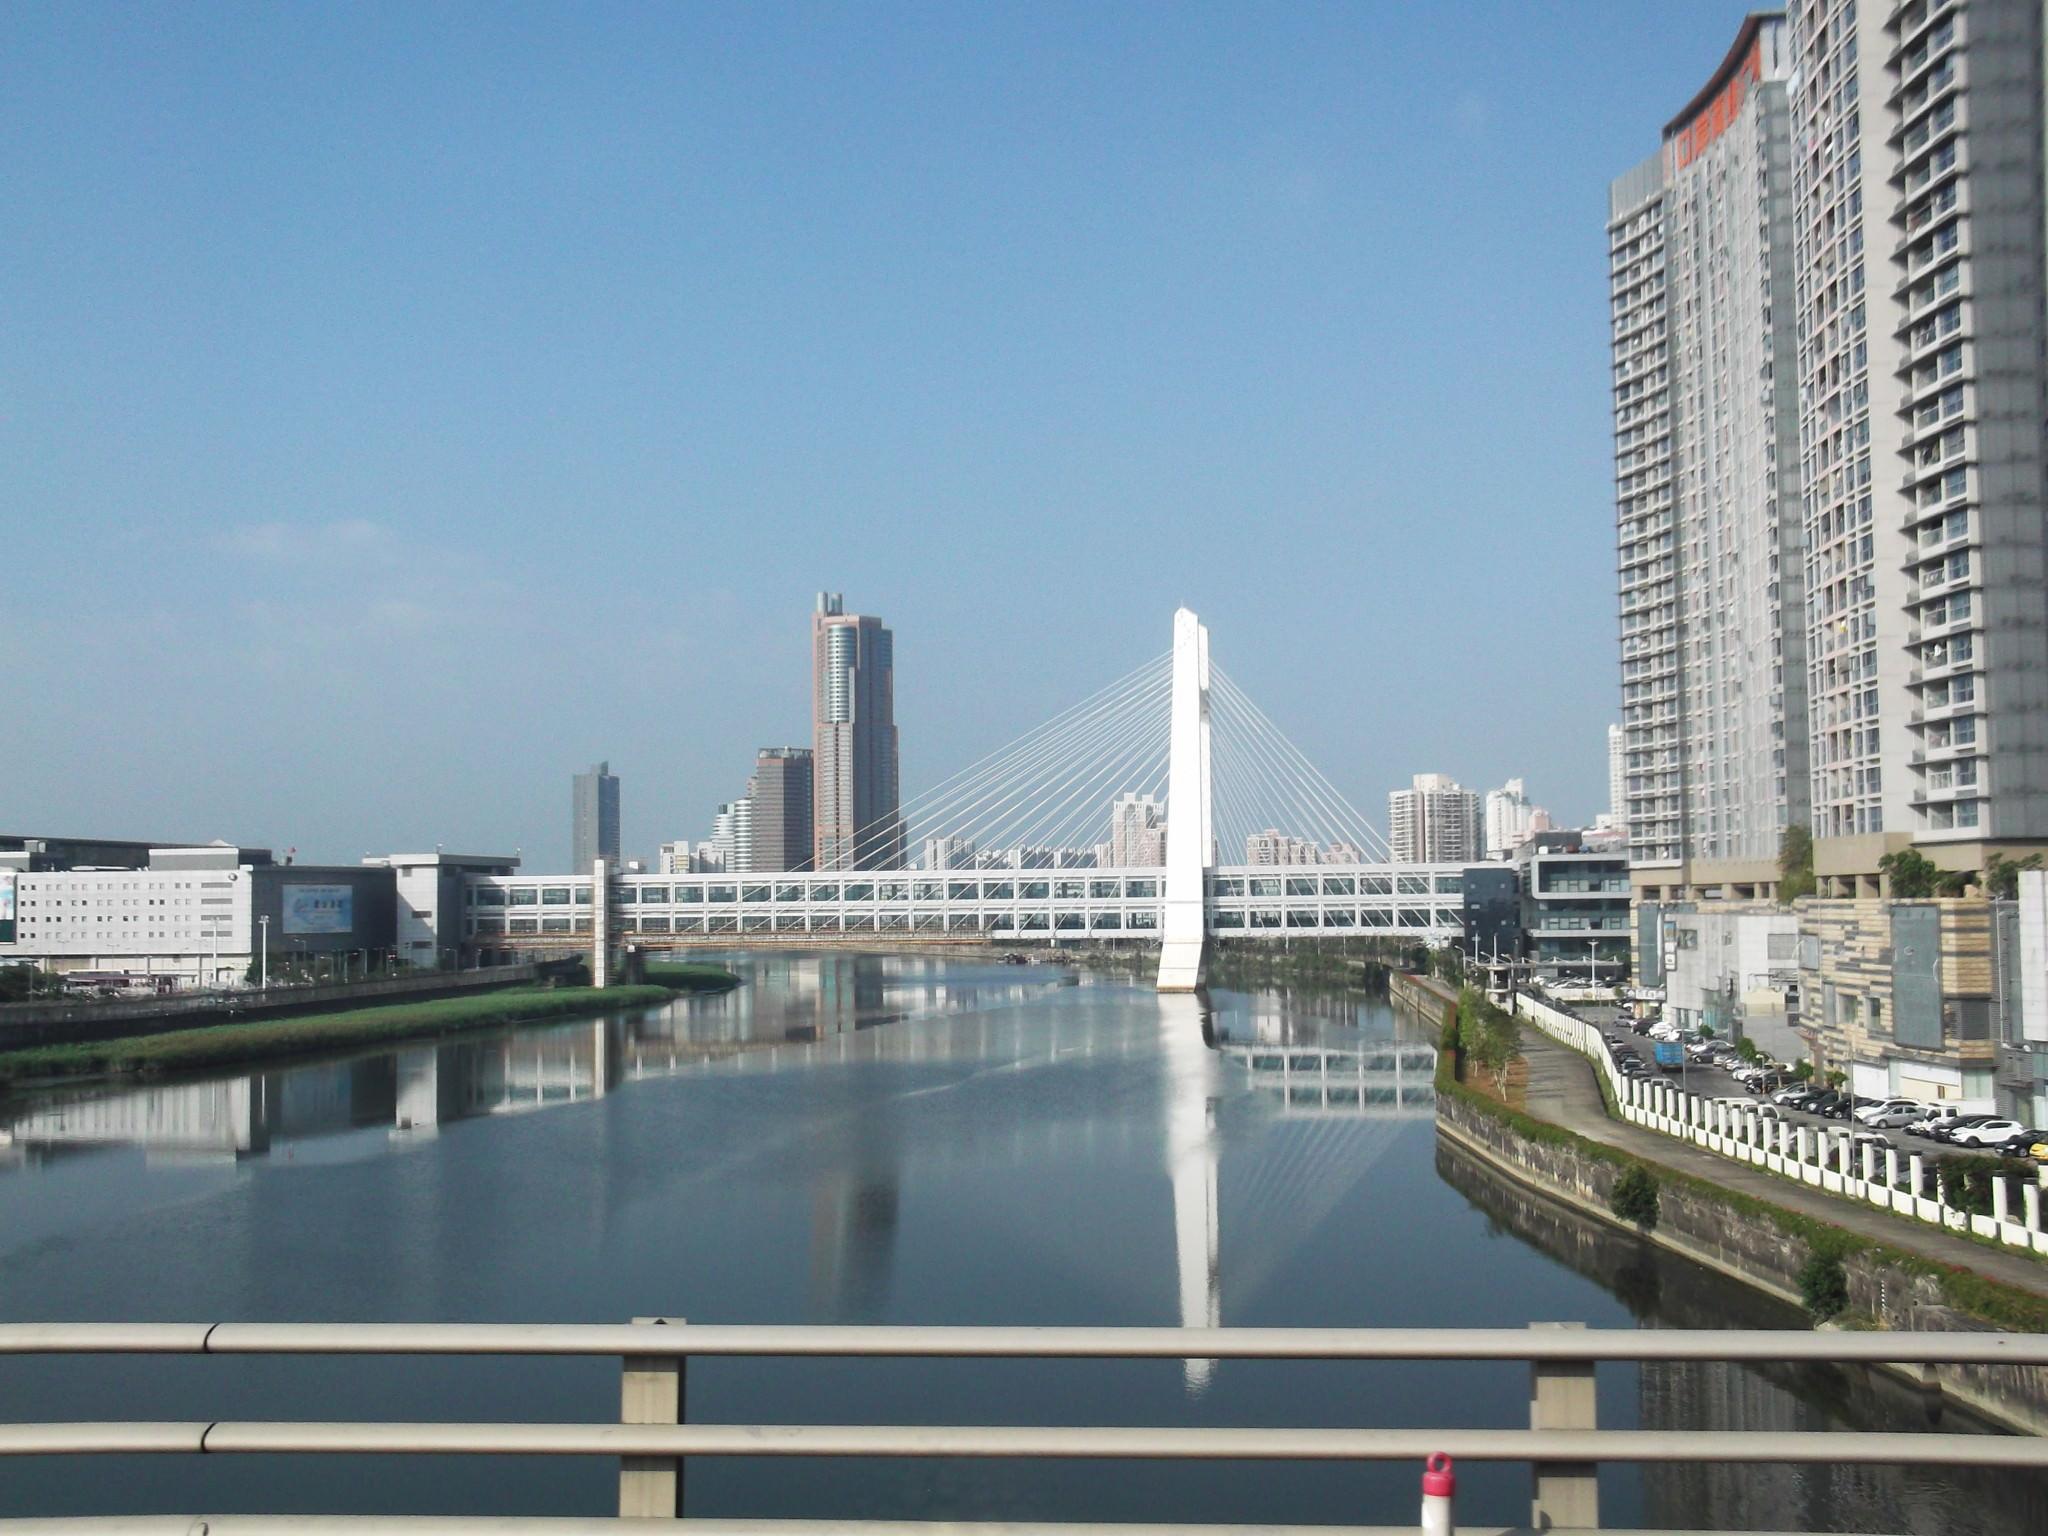 ... How to get from Hong Kong to China (Kwun Tong to Huanggang, Shenzhen